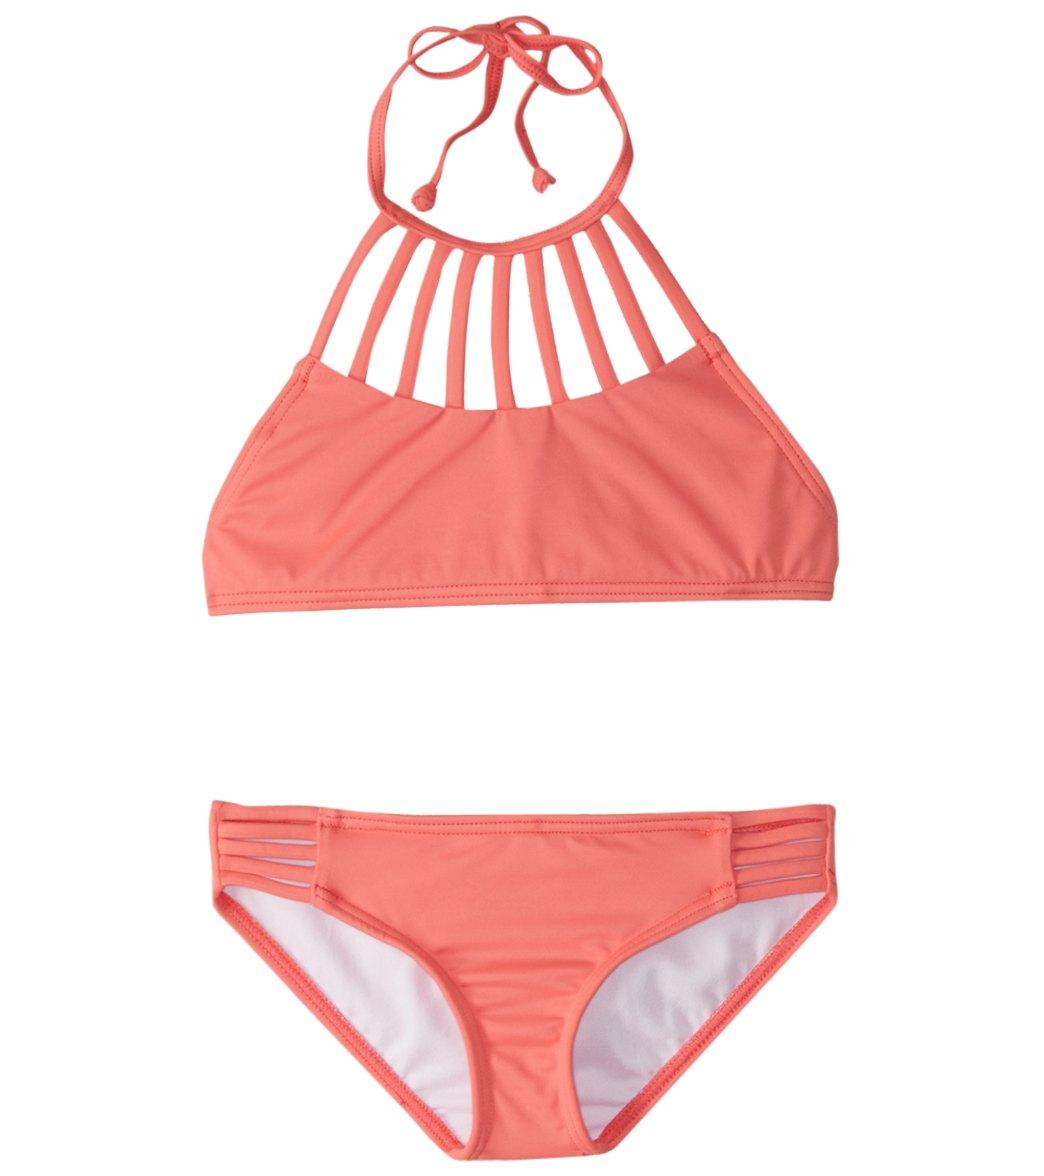 ceddf670164413 Billabong Girls  Sol Searcher High Neck Bikini Set (4-14) at SwimOutlet.com  - Free Shipping